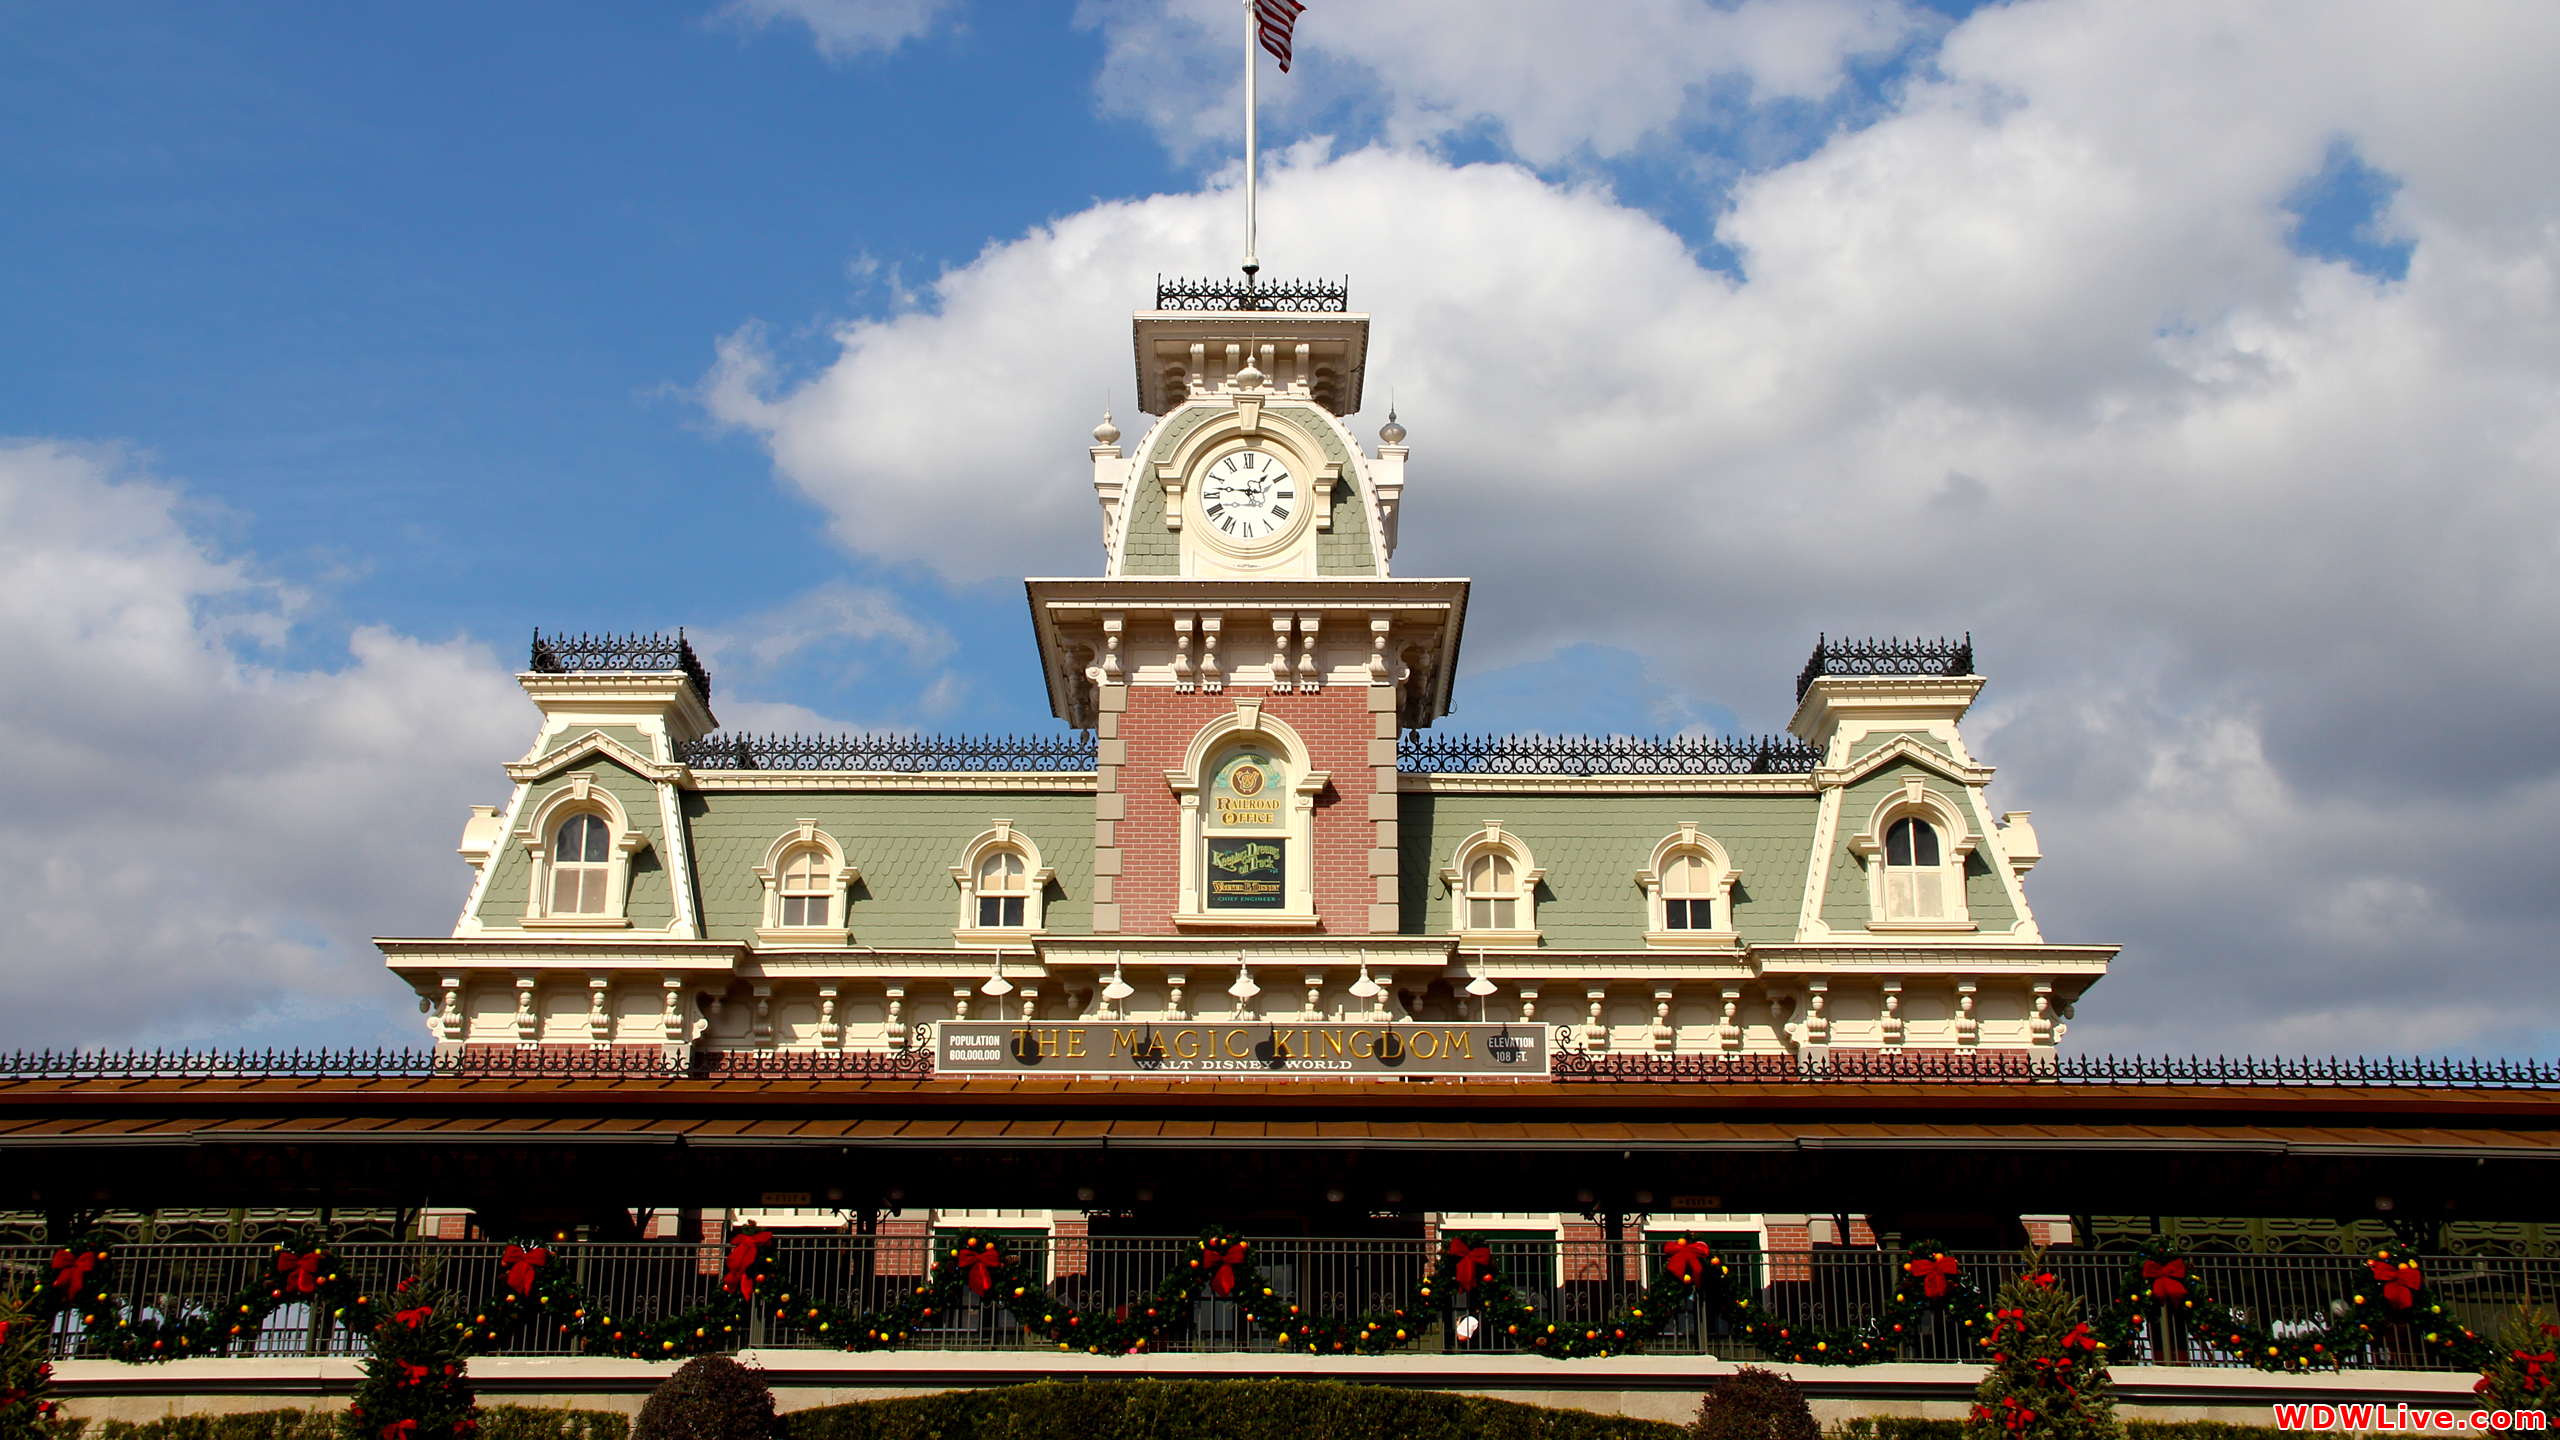 Walt Disney World Railroad Desktop Wallpaper 2560x1440 2560x1440